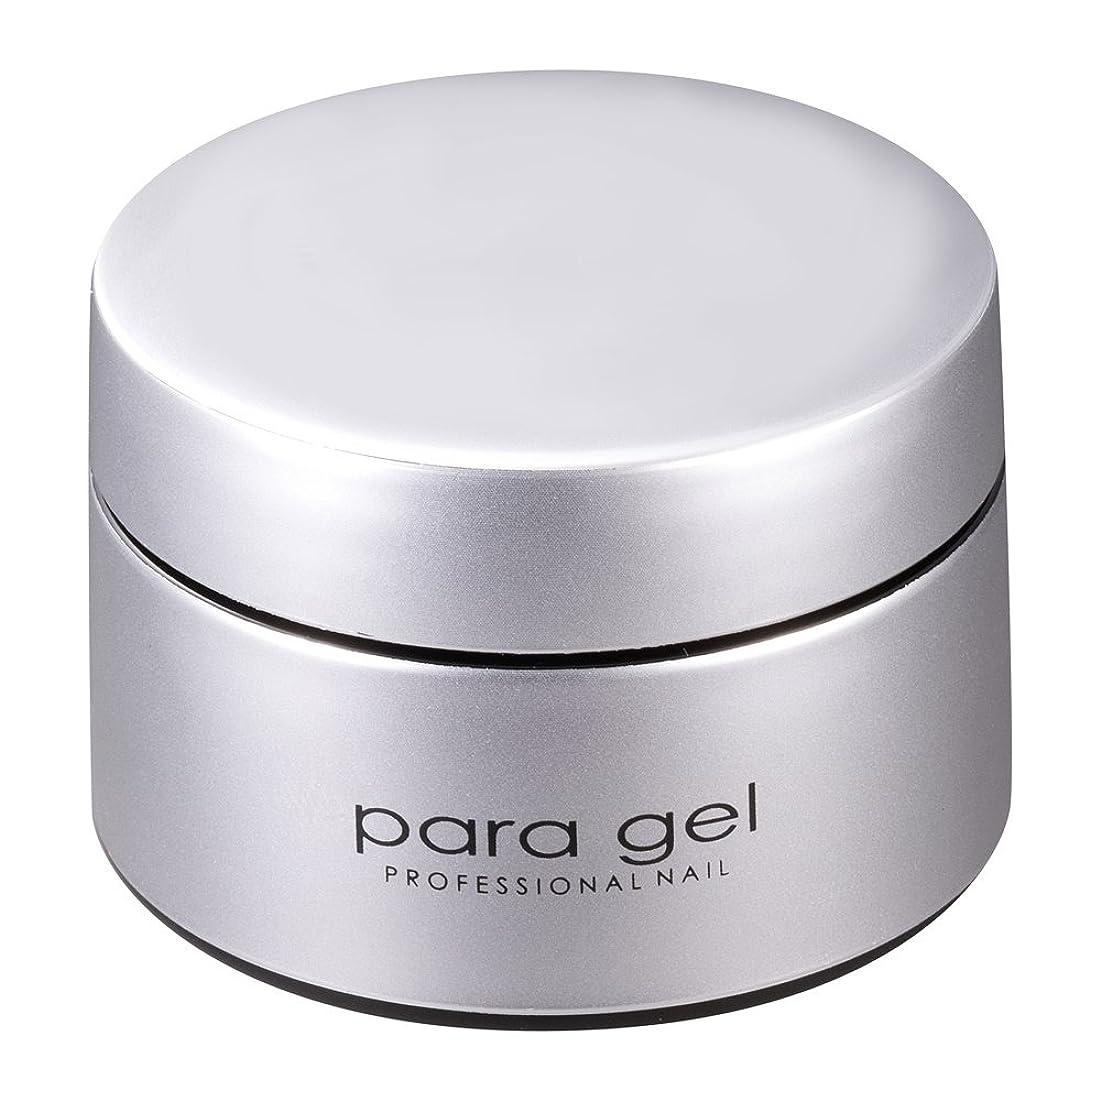 para gel ファンデーションカラージェル F04 ライトミディアムイエローベージュ 4g